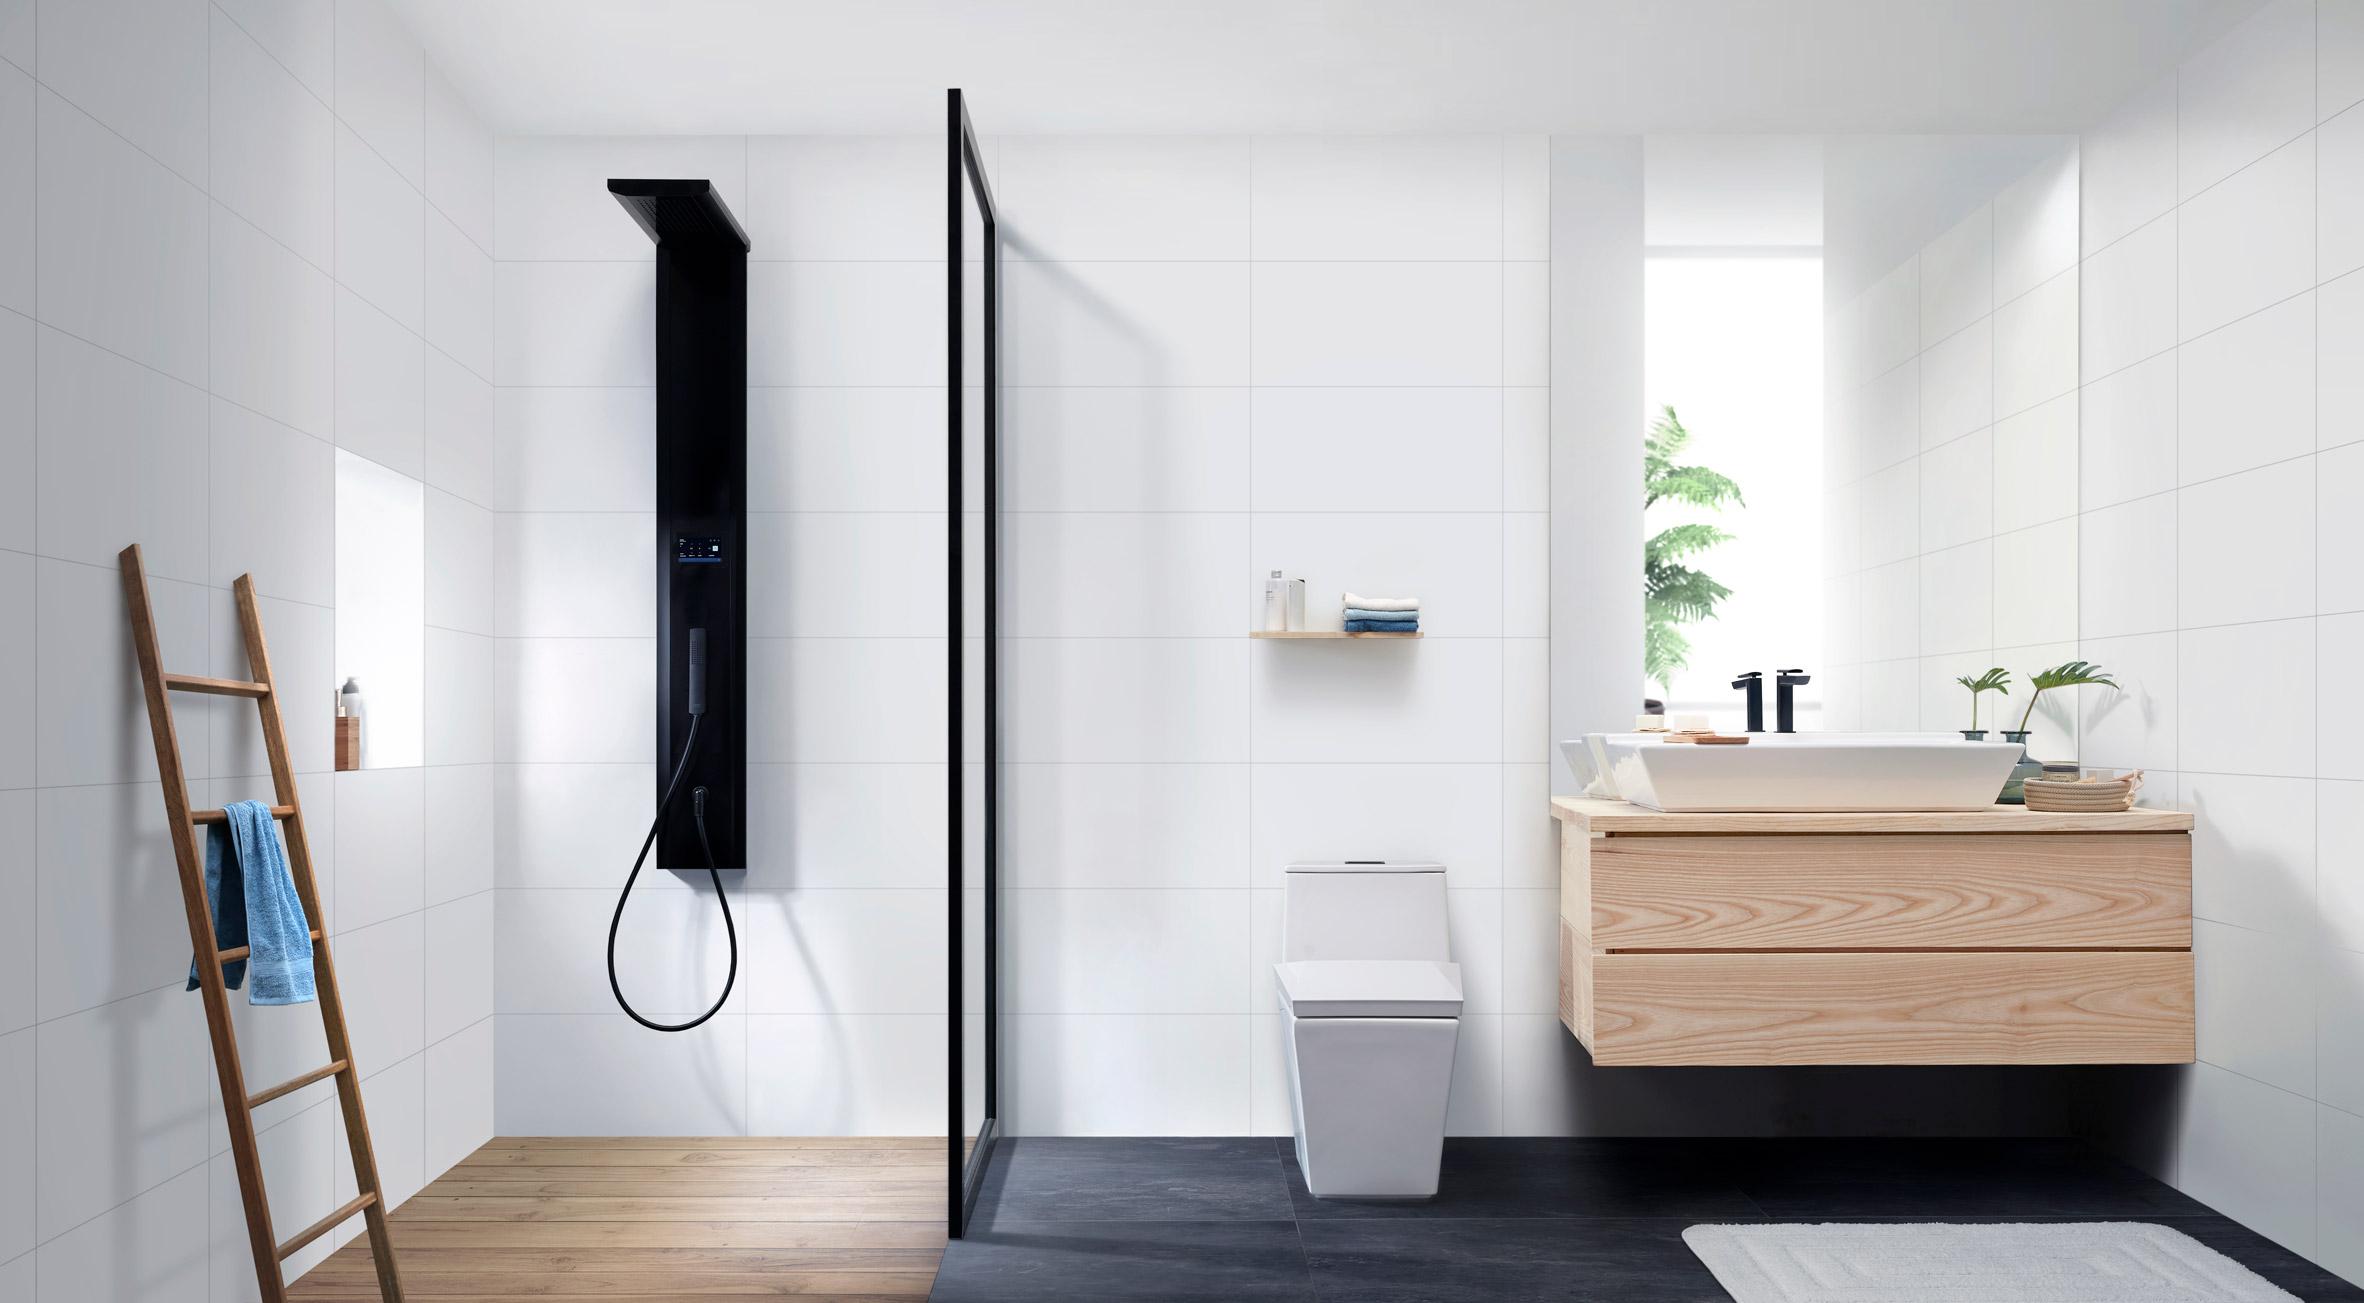 Jacob Jensen Design Creates Minimalist Bathroom Collection